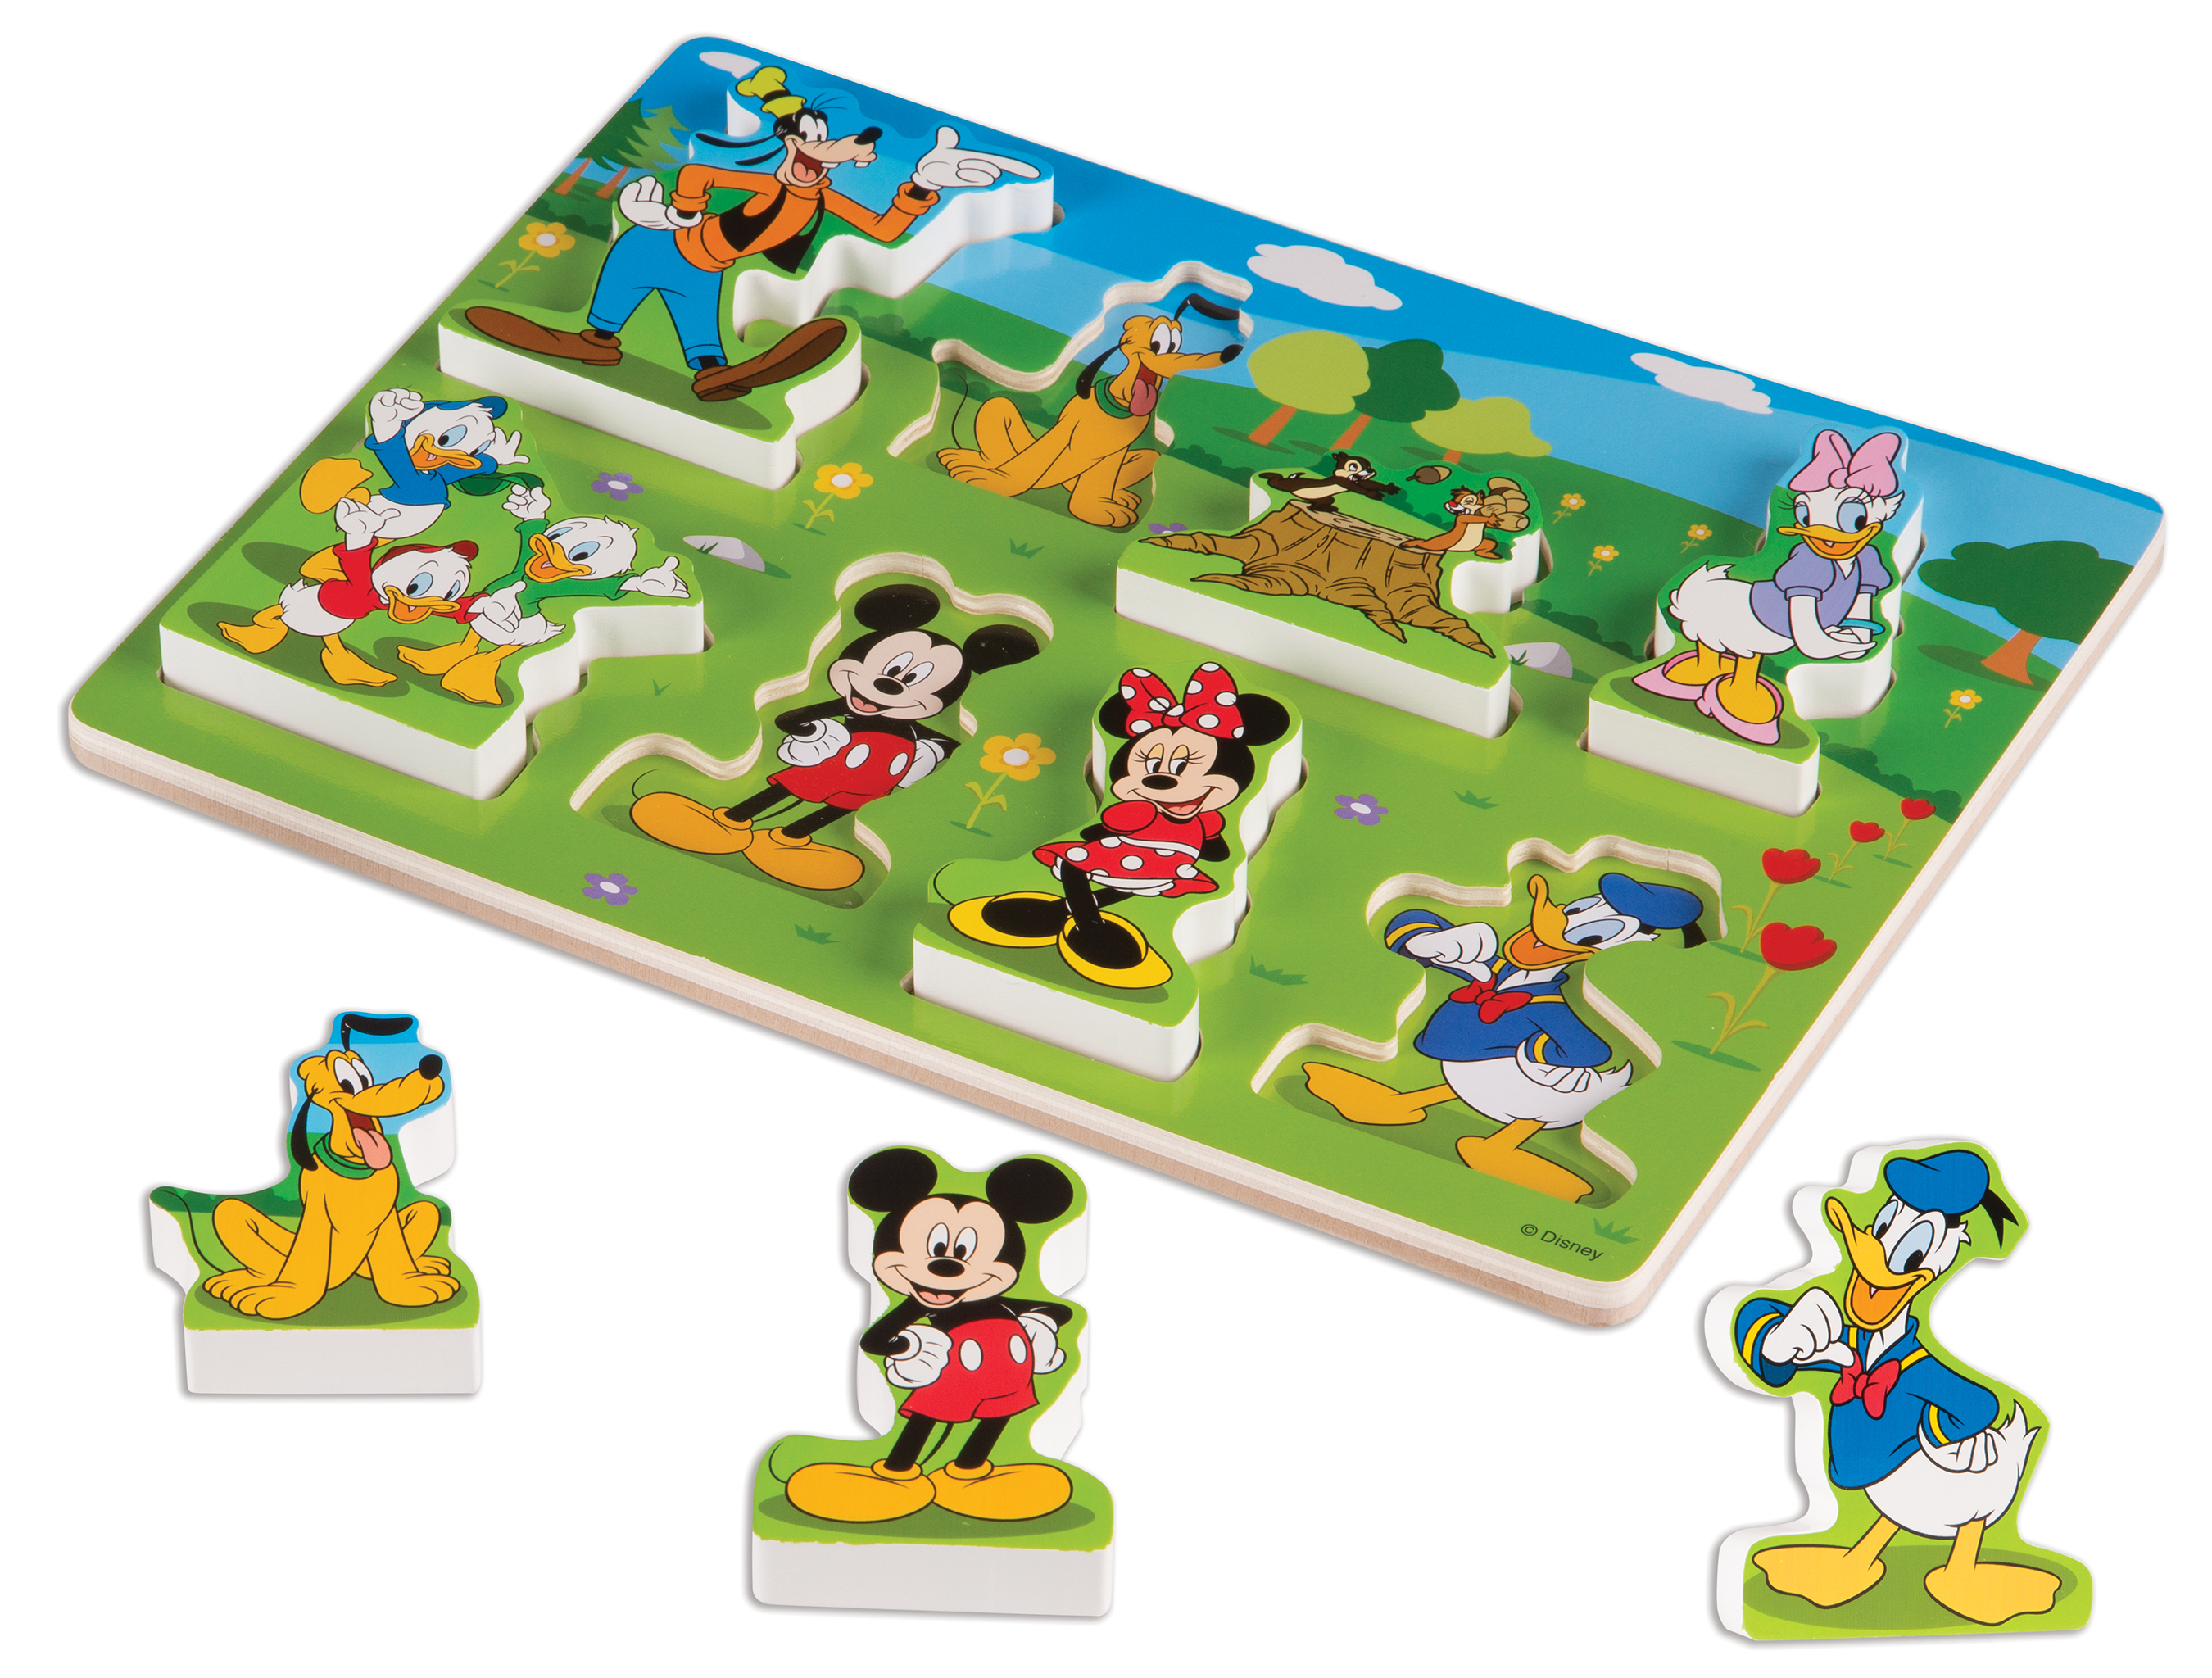 Melissa & Doug Disney Mickey Mouse Wooden Chunky Puzzle (8 pcs) by Melissa & Doug